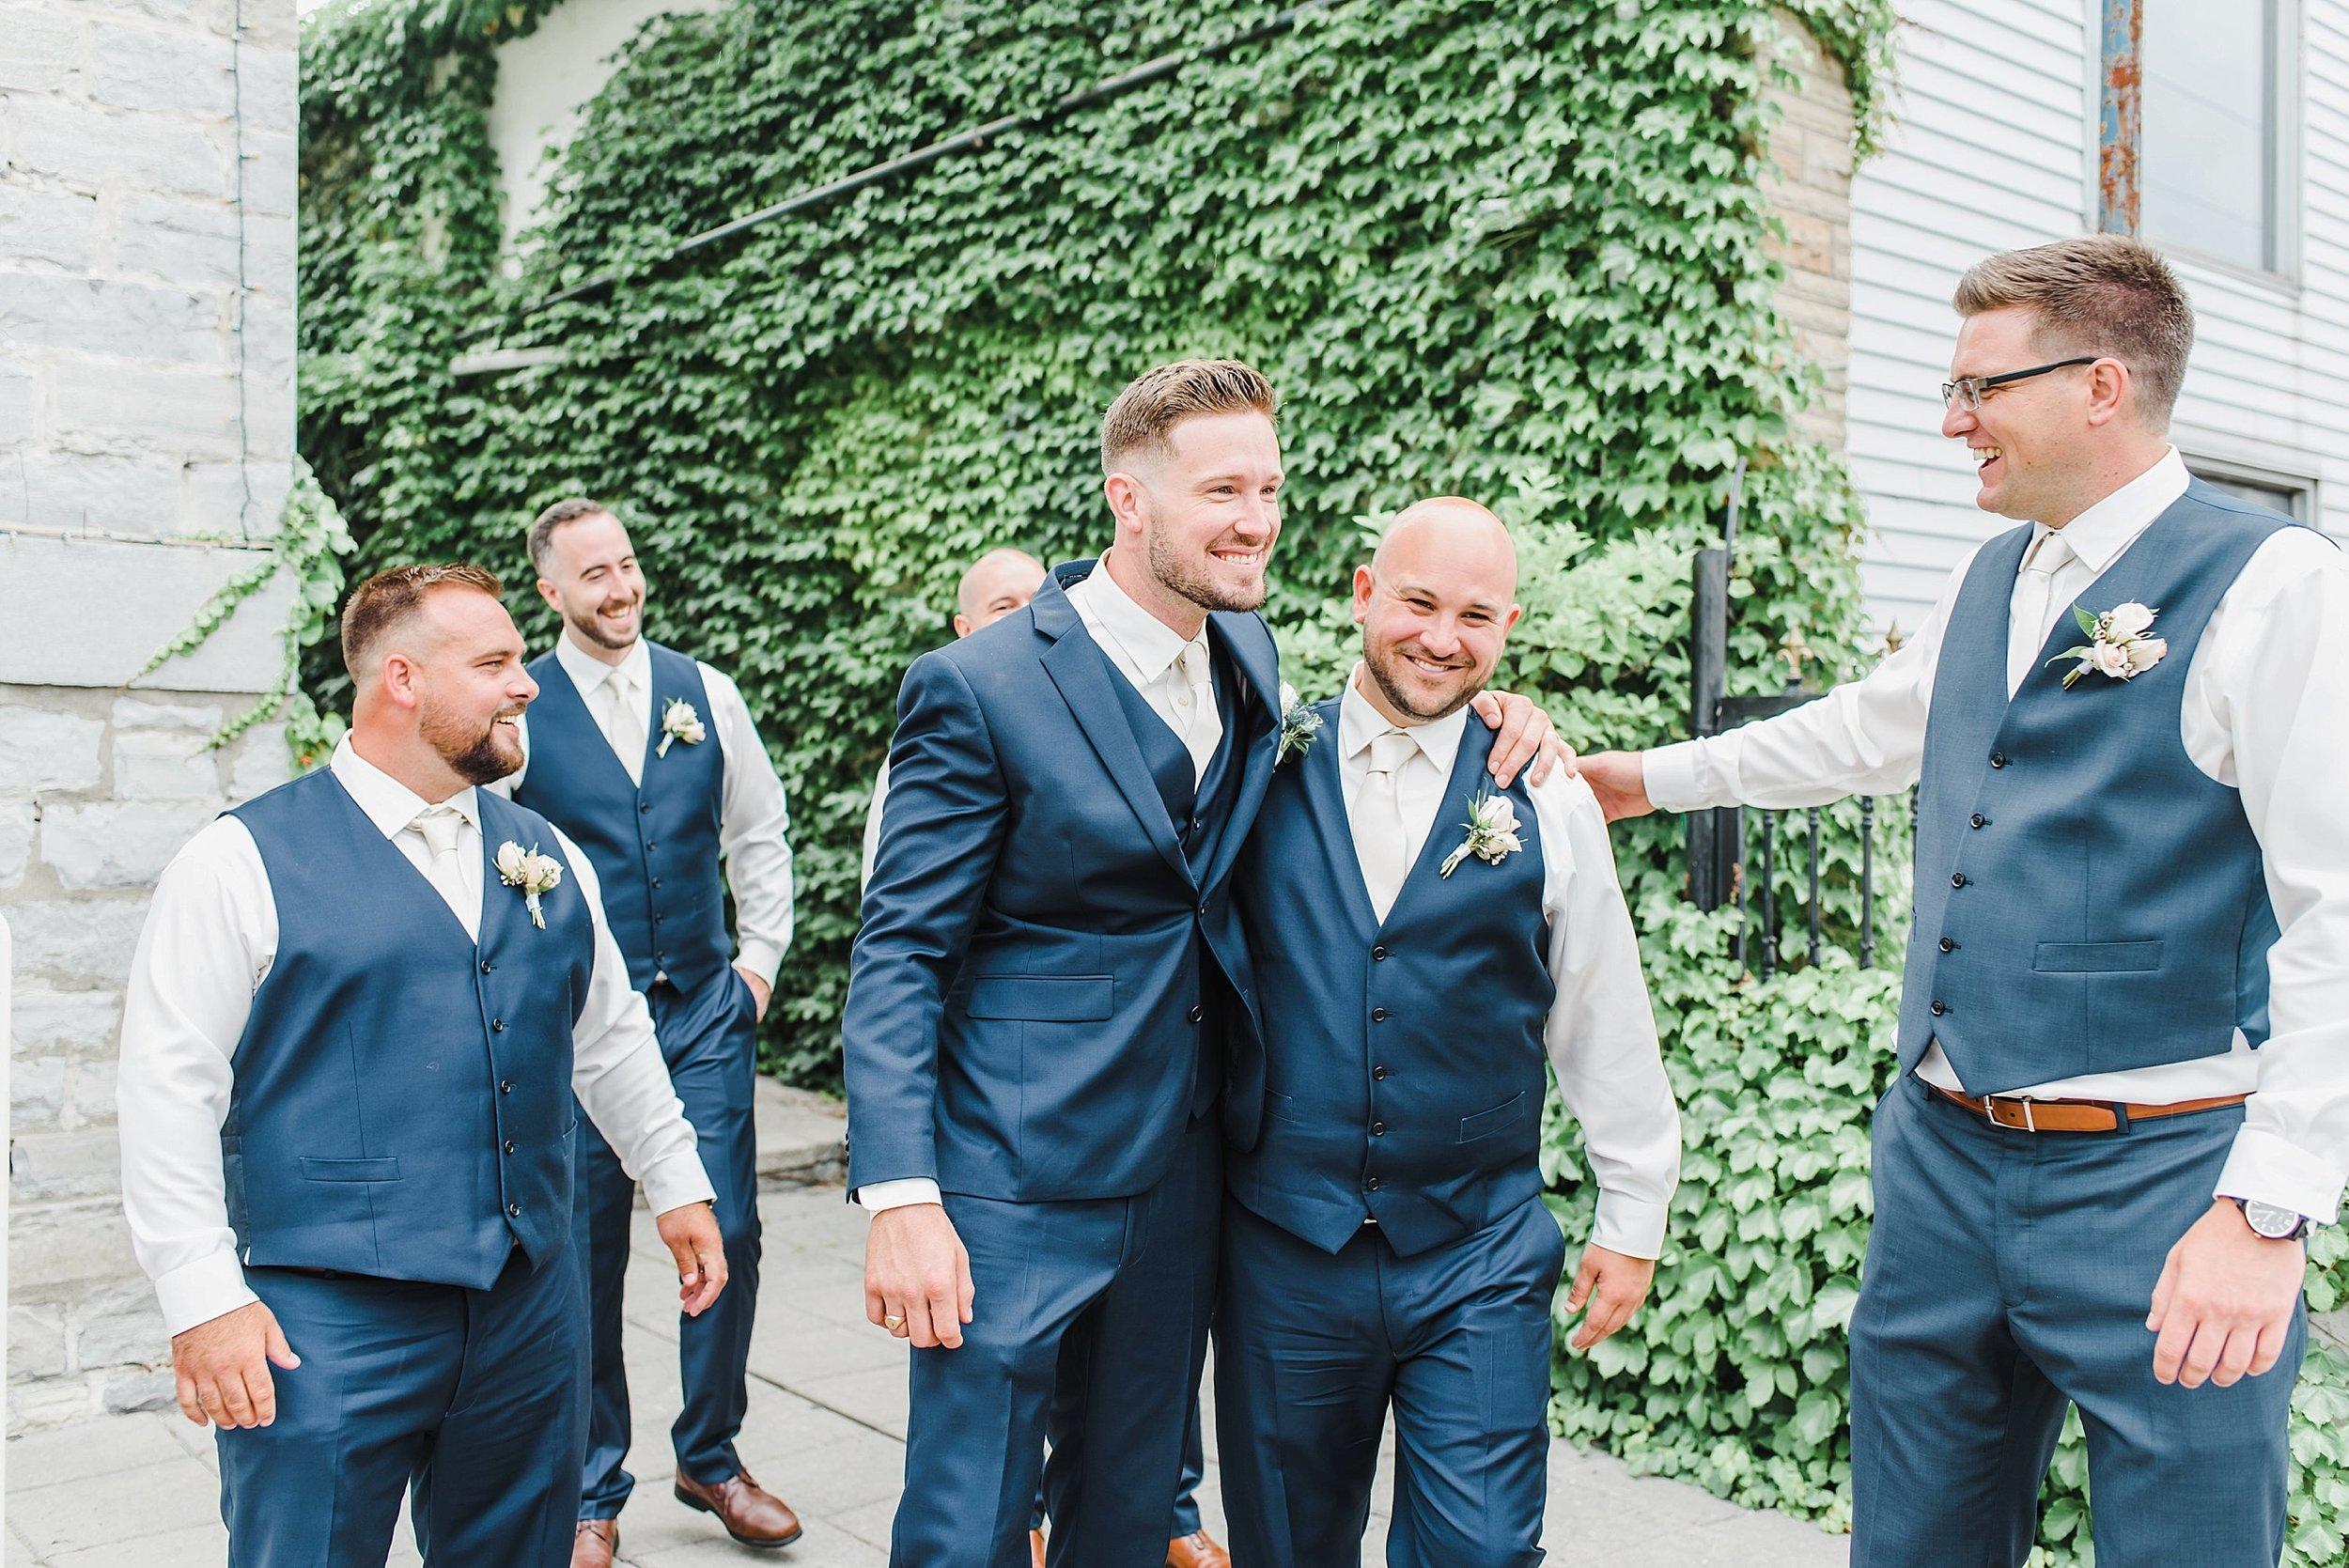 light airy indie fine art ottawa wedding photographer | Ali and Batoul Photography_0200.jpg